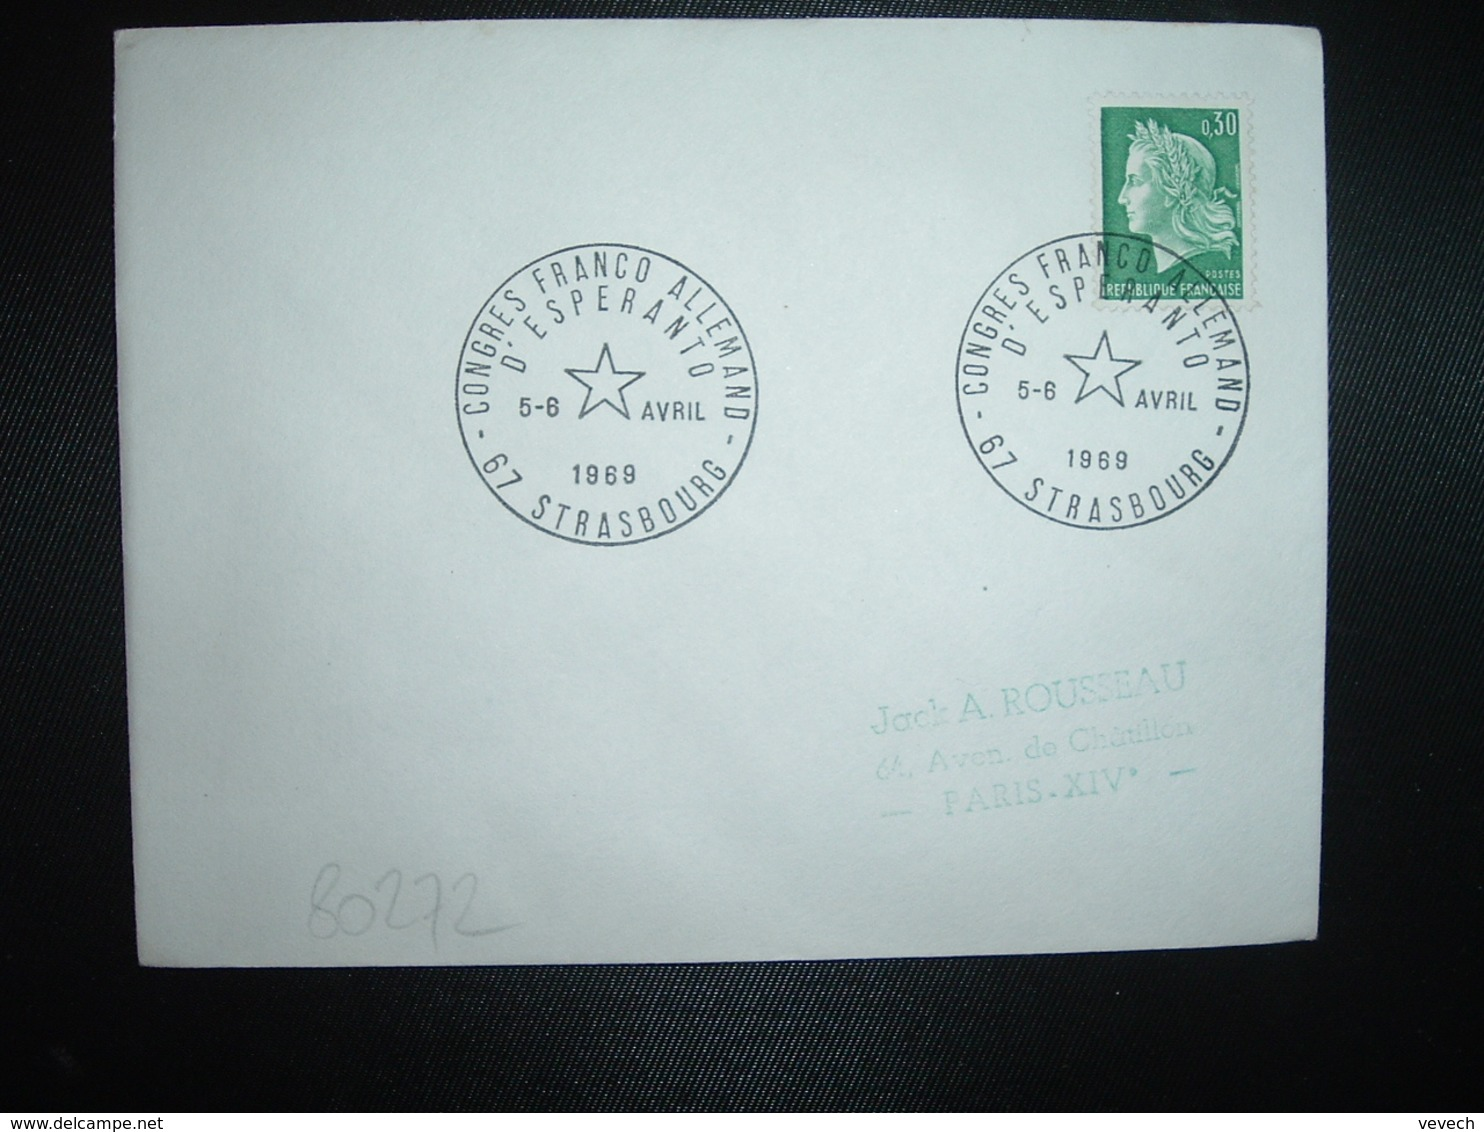 LETTRE TP FRANCE M. DE CHEFFER 0,30 OBL.5-6 AVRIL 1969 67 STRASBOURG CONGRES FRANCO-ALLEMAND D'ESPERANTO - Esperanto